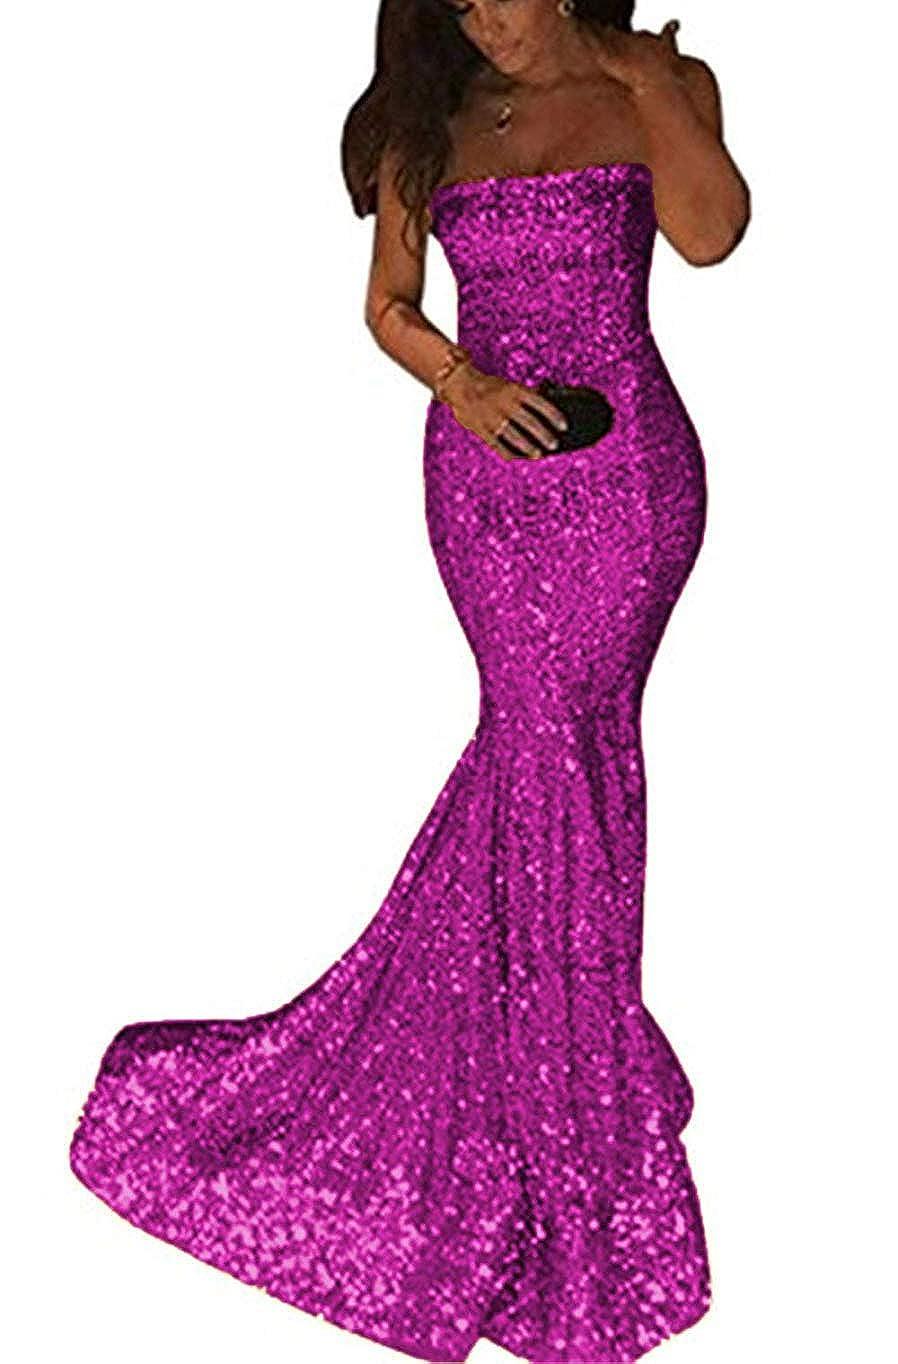 Fuchsia ZLQQ Sequins Mermaid Prom Bridesmaid Dress Strapless Long Evening Party Dress for Women